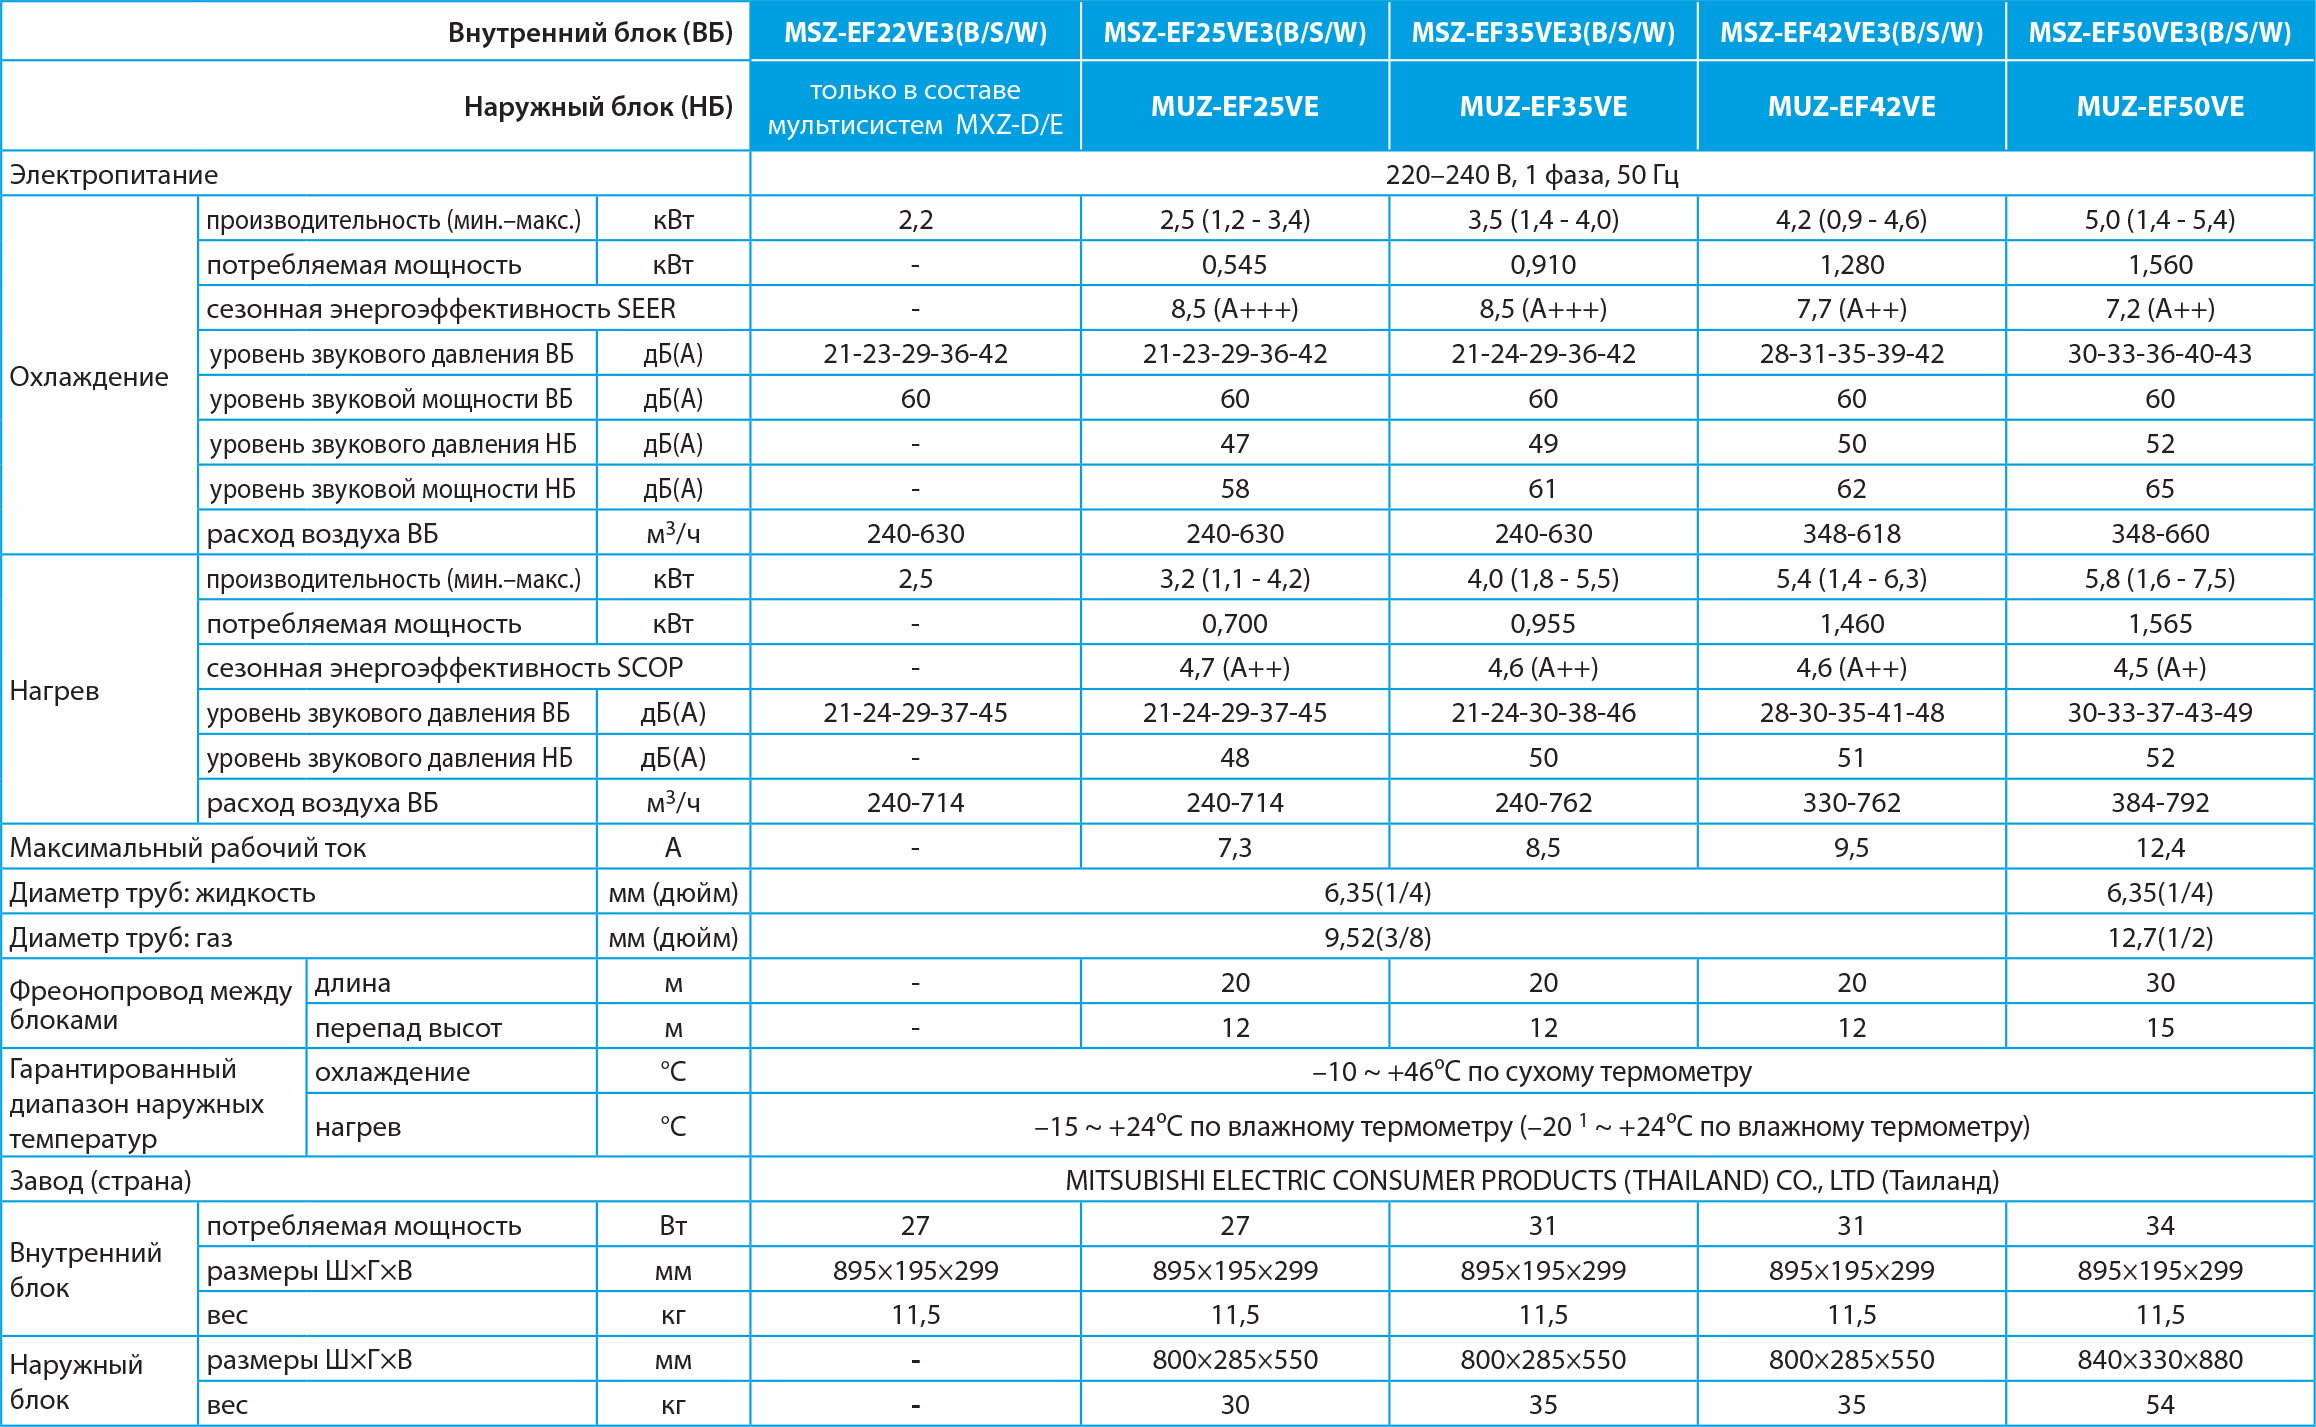 Технические характеристики кондиционера Mitsubishi Electric MSZ-EF50VEW / MUZ-EF50VE серии Design Inverter